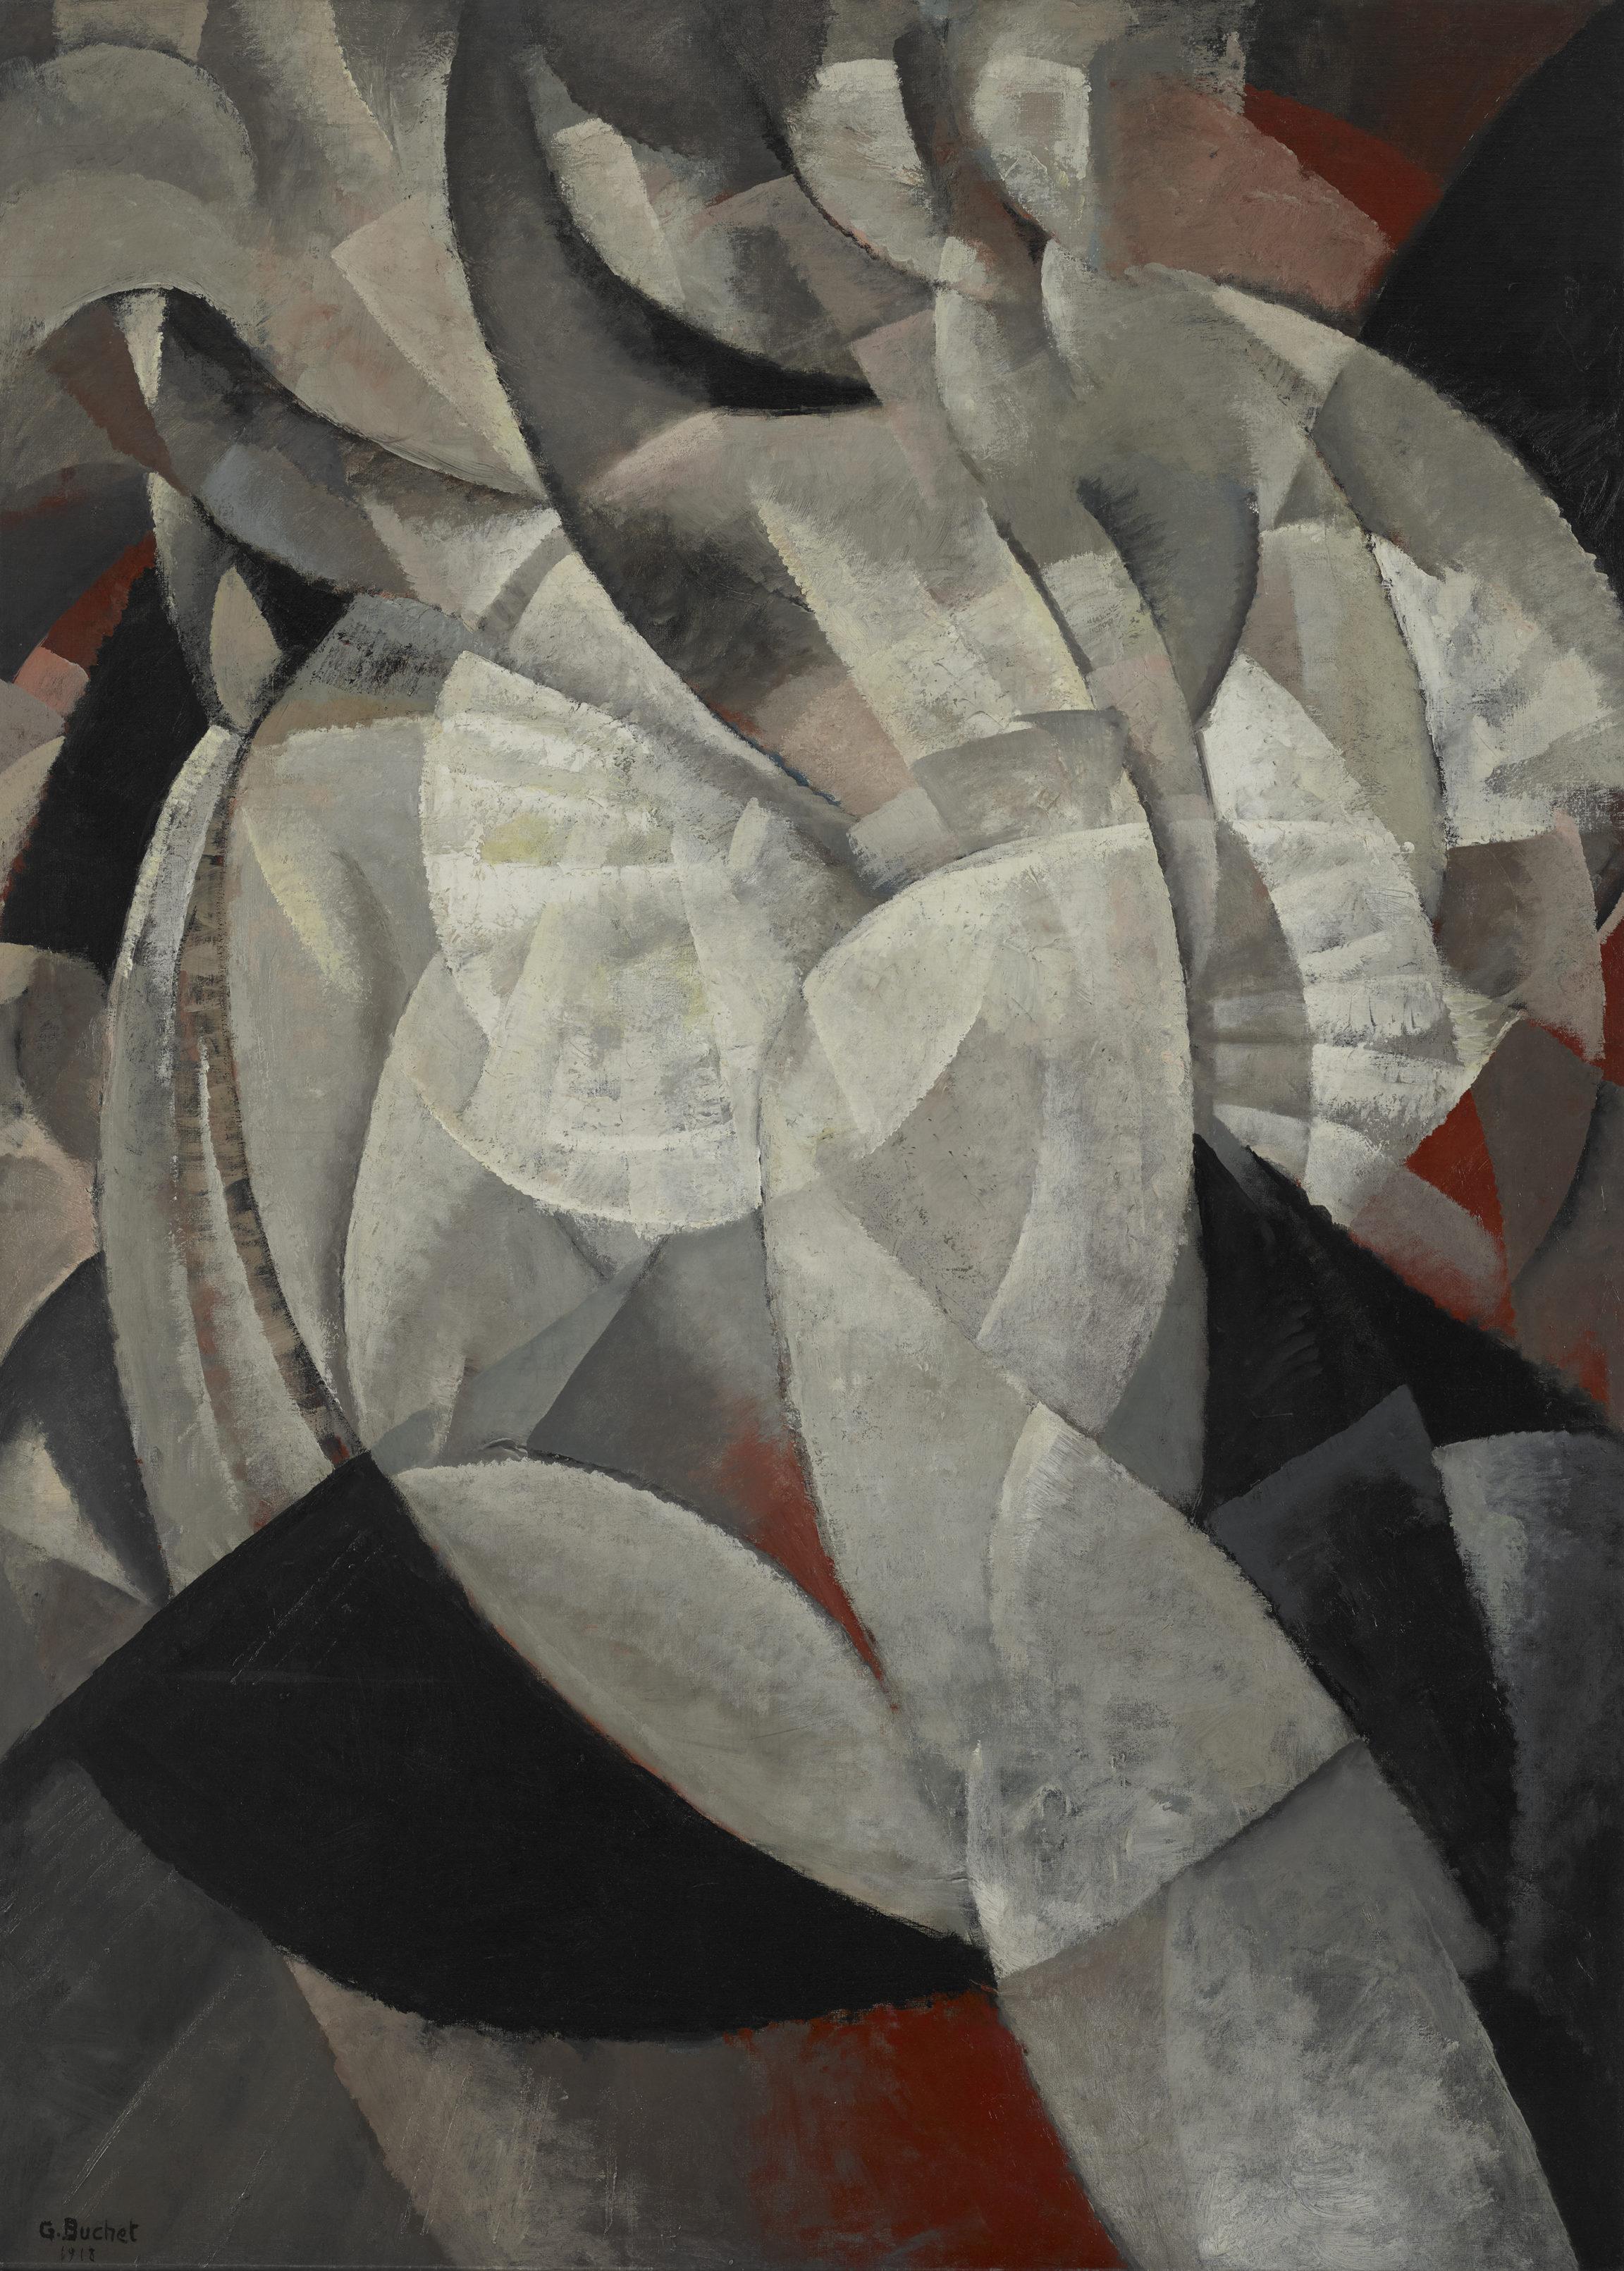 Gustave Buchet , Danseuse en mouvement (Dancer in Motion), 1918